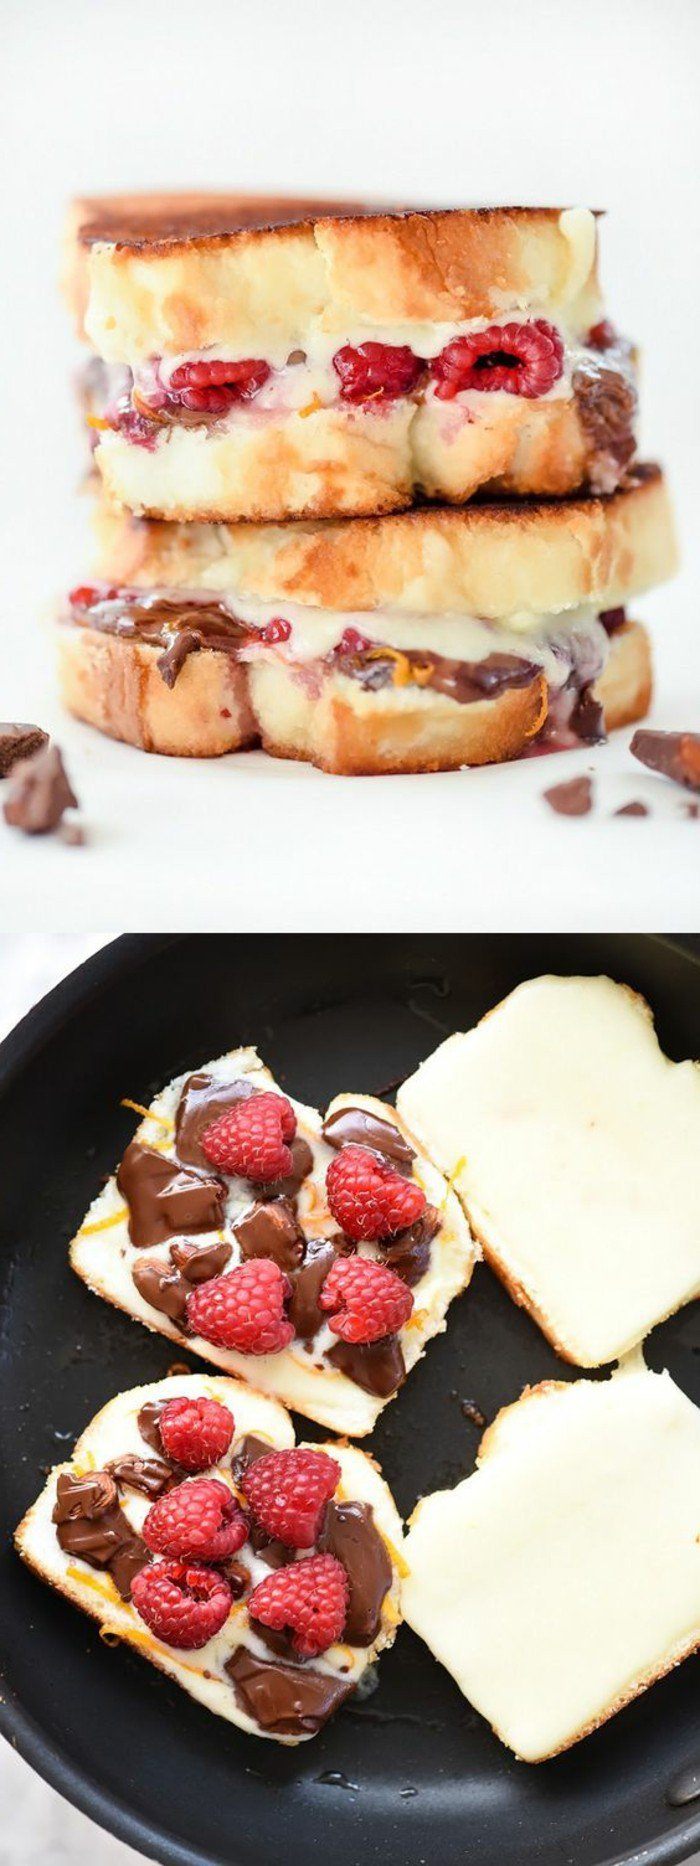 merveilleuse-recette-tarte-a-la-framboise-dessert-a-la-framboise